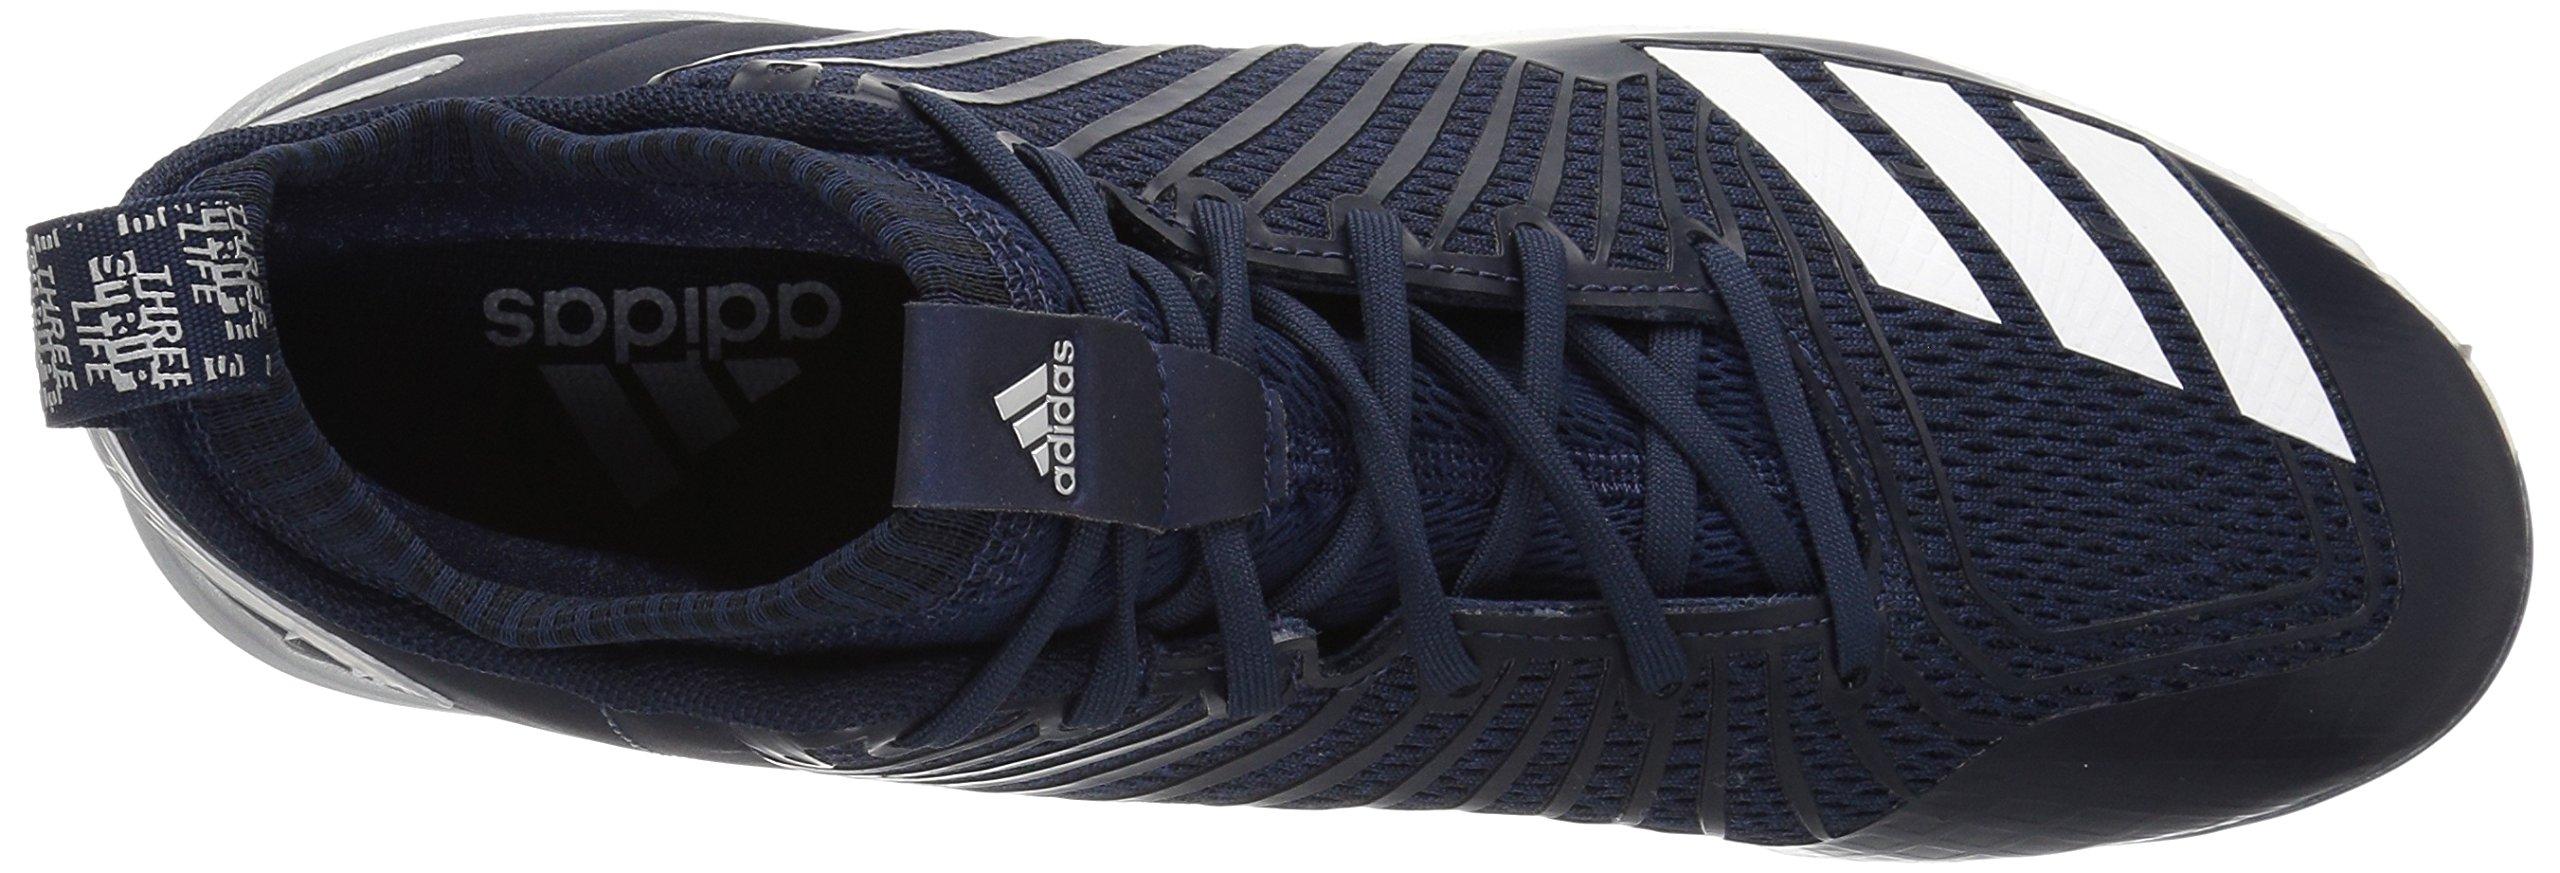 adidas Men's Freak X Carbon Mid Baseball Shoe, Collegiate Navy/White/Metallic Silver, 8 Medium US by adidas (Image #8)